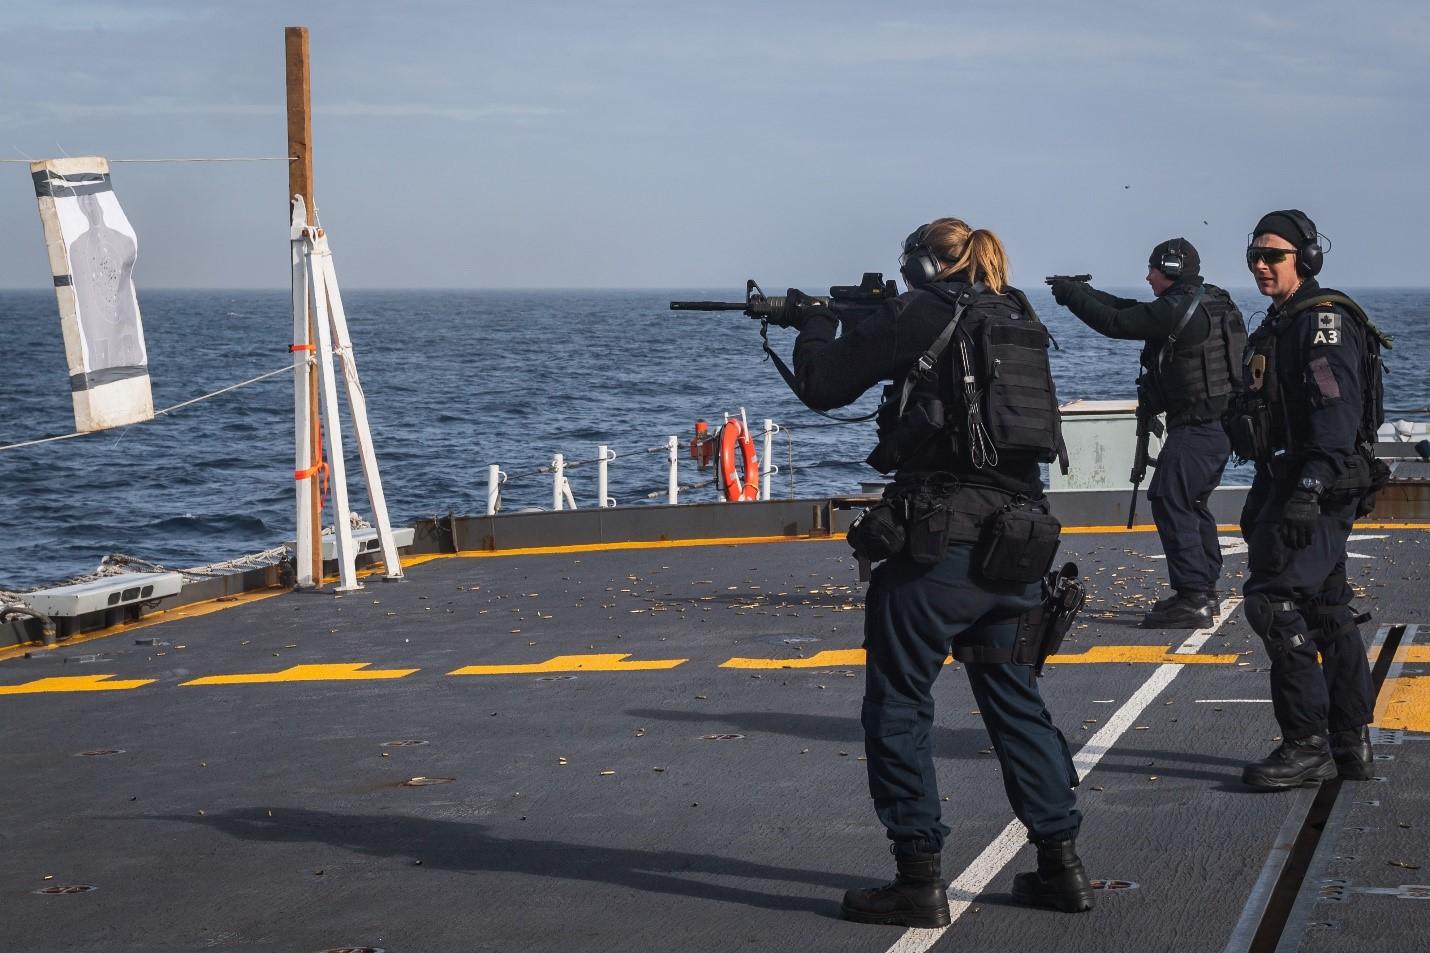 NBP training aboard HMCS Halifax